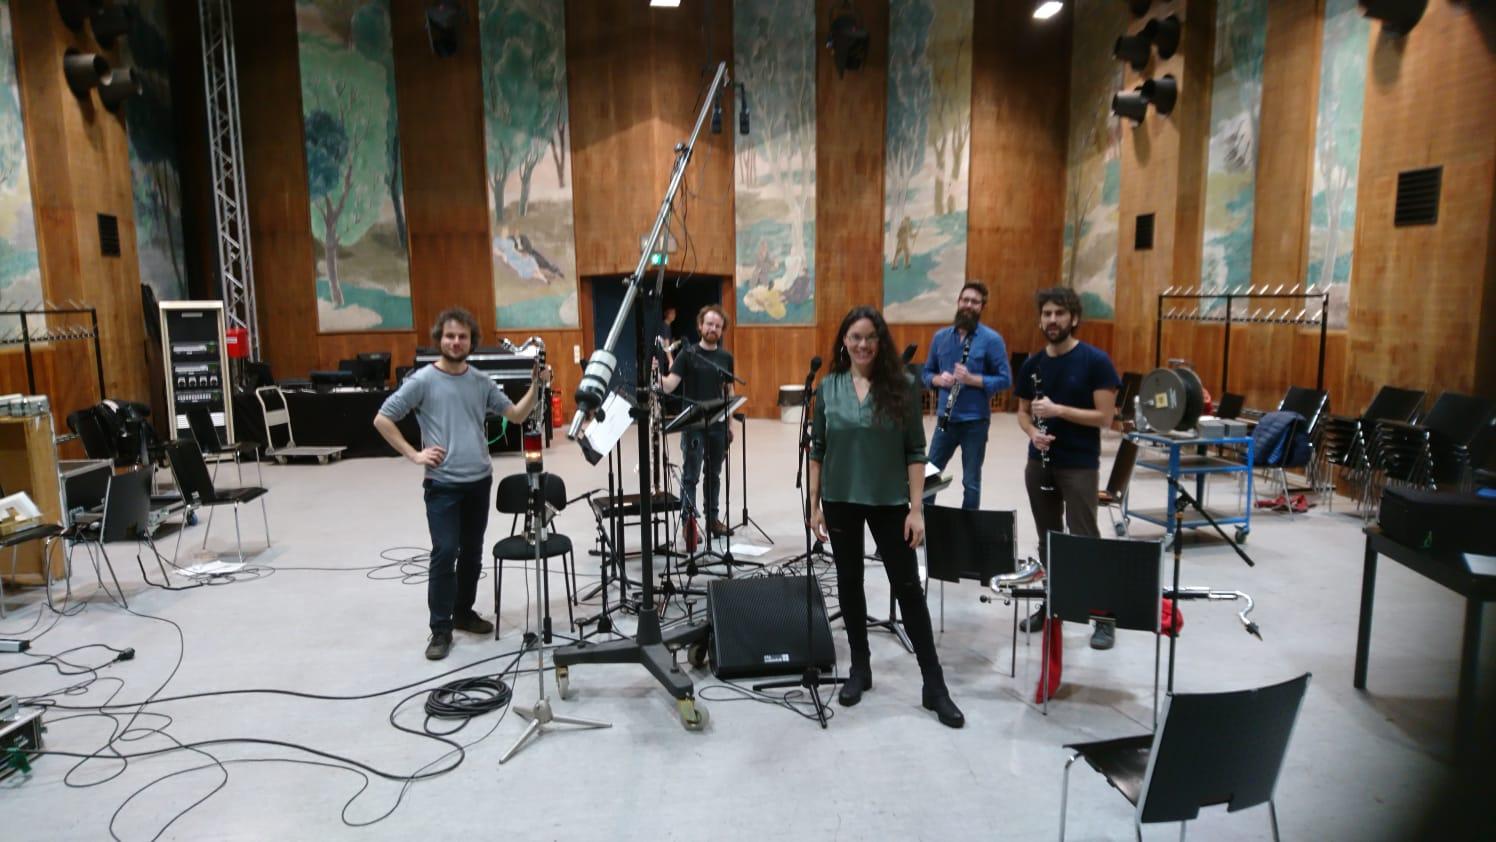 Patricia Moreno - the Jazz Singer with WB4 live on air at Radio Kulturhaus Vienna